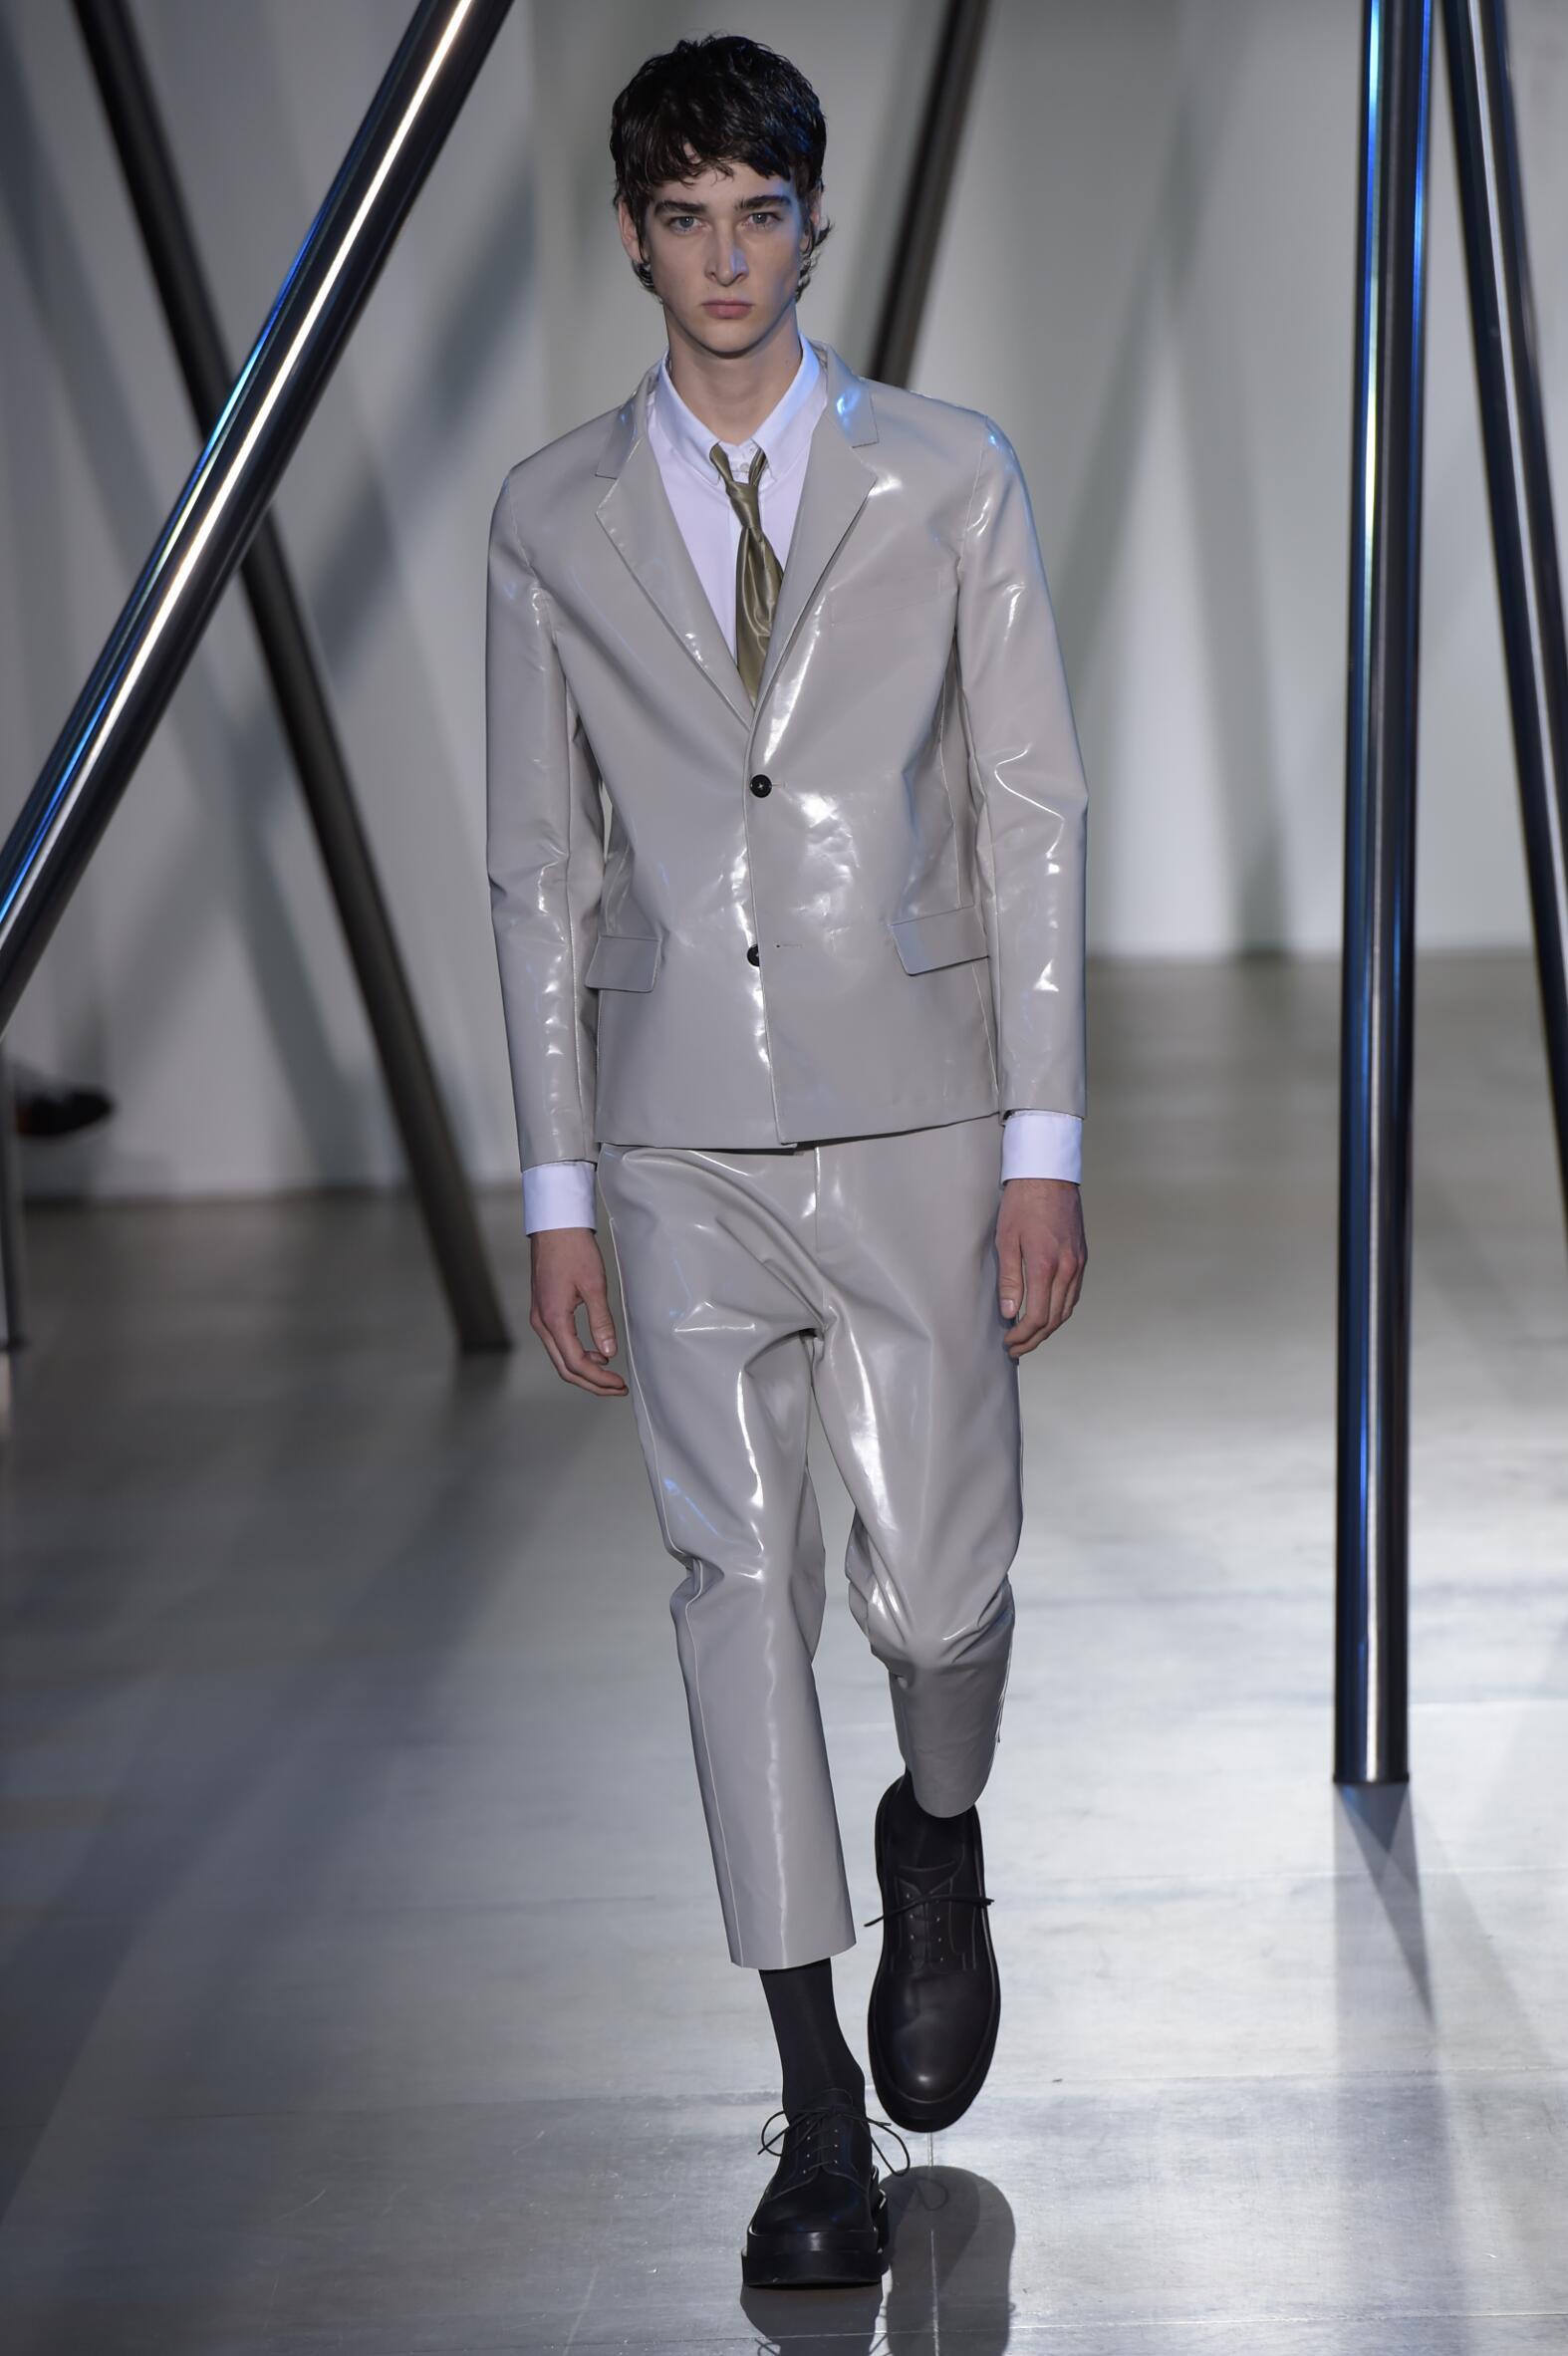 Fashion Show SS 2016 Jil Sander Menswear